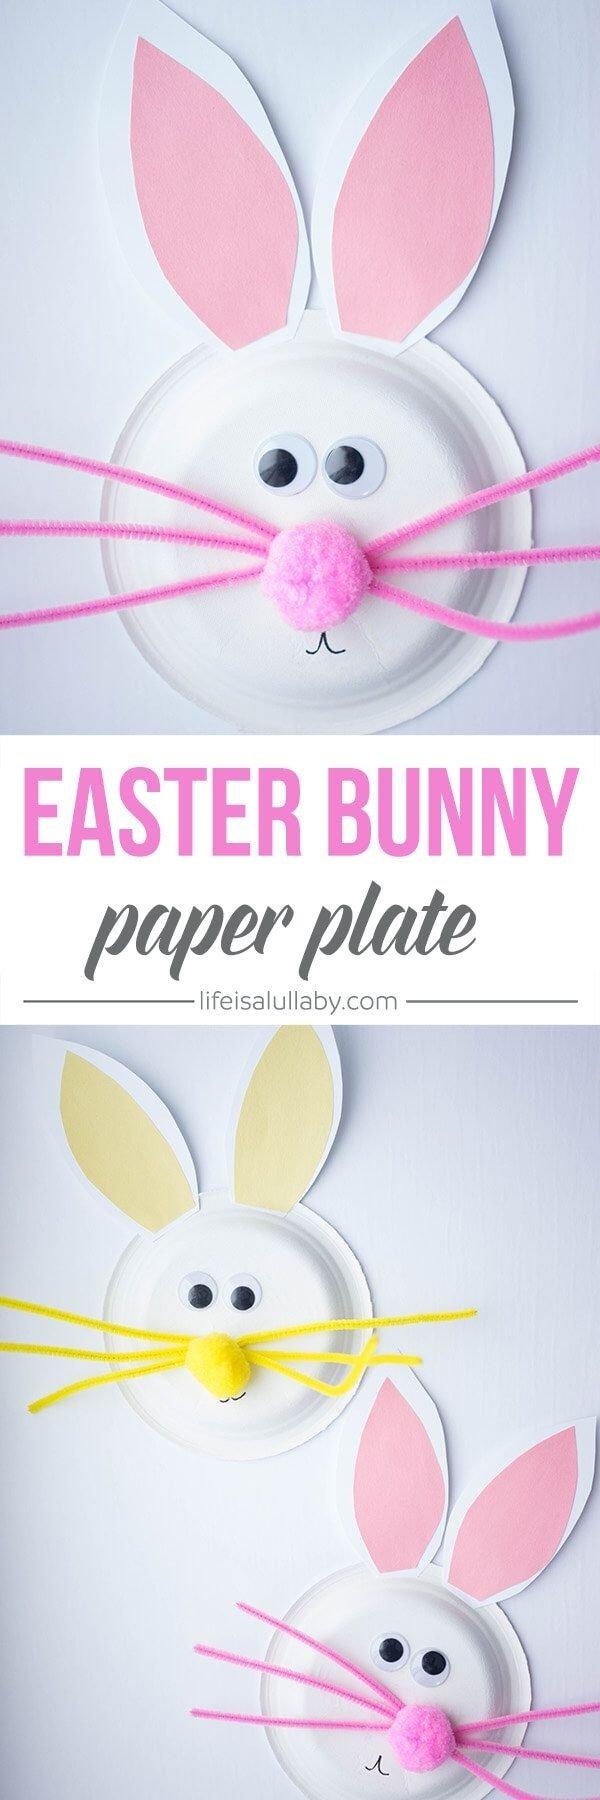 10 Unique Easter Craft Ideas For Preschoolers paper plate easter bunny craft easter bunny easter and bunny 2020